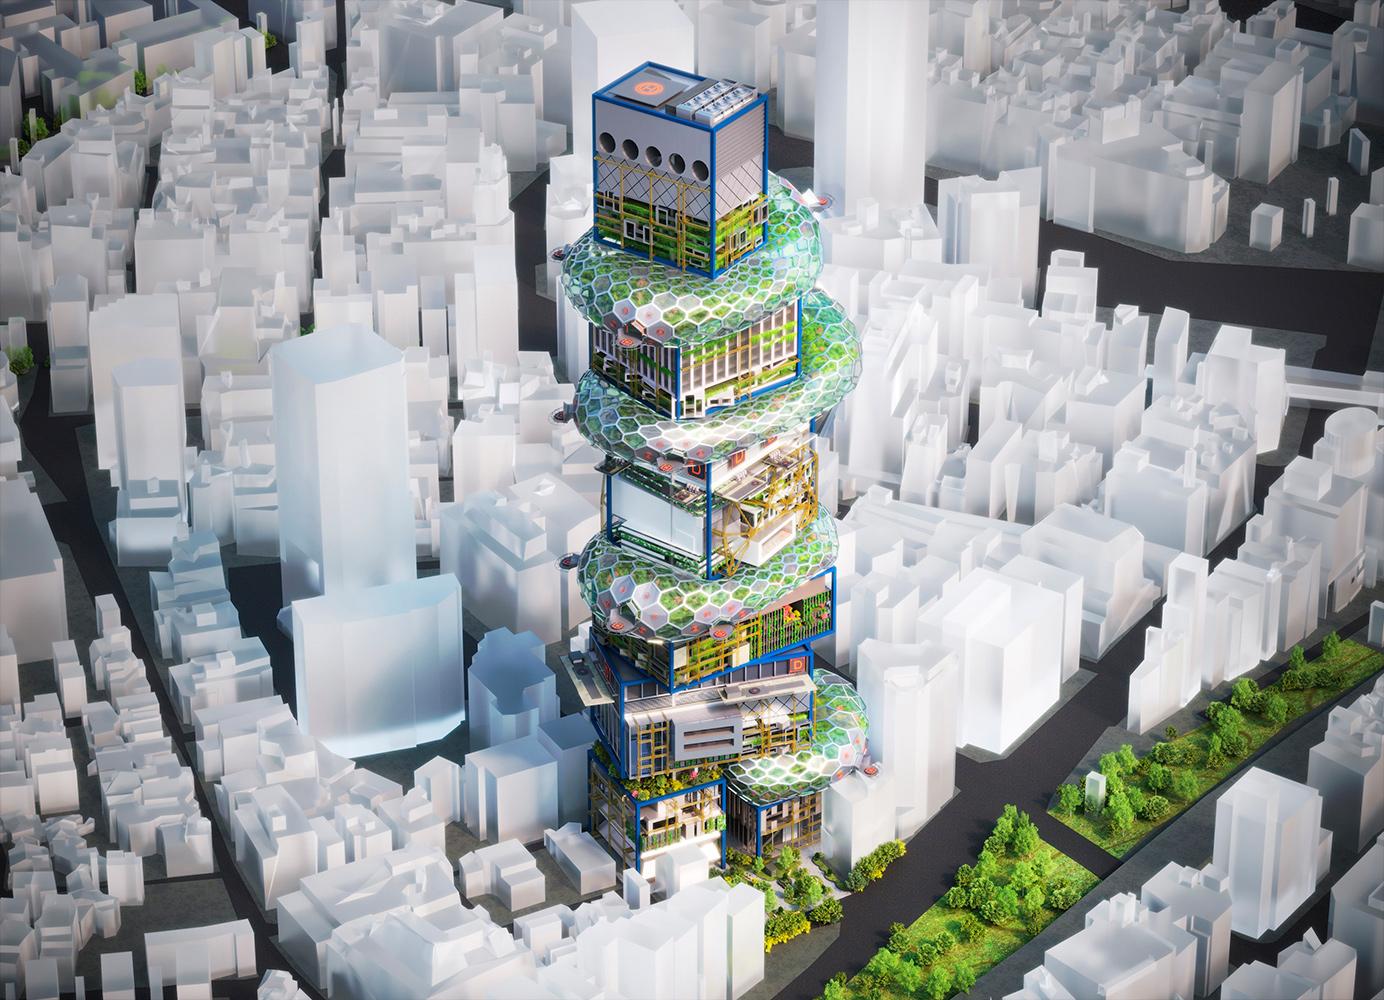 🏬 U Japoniї prezentuvaly «vertykaľne misto majbutńogo» — ce može rozv'jazaty problemu perenaselennja